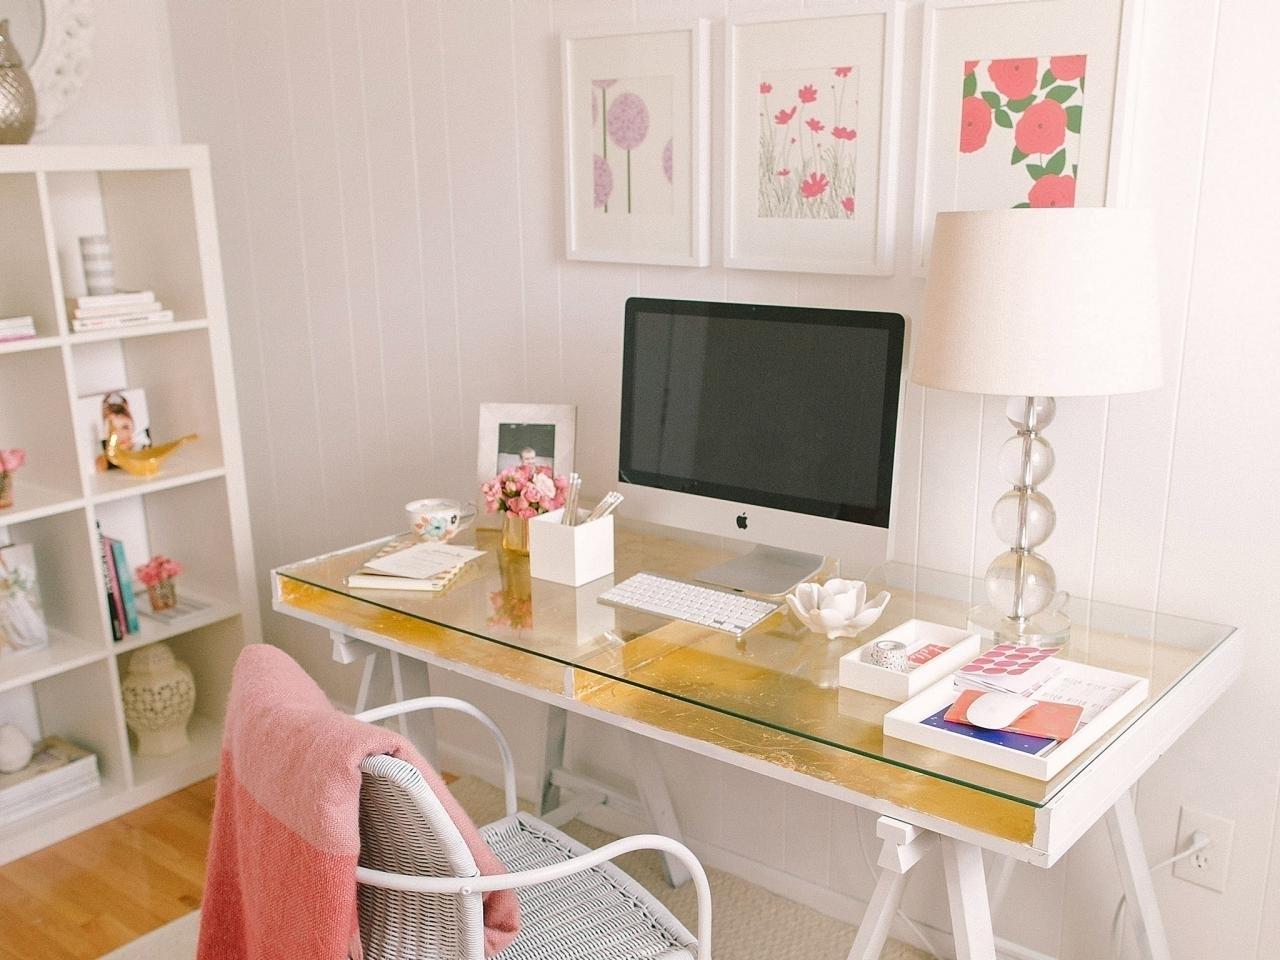 Golden desk represents luxury and high standards